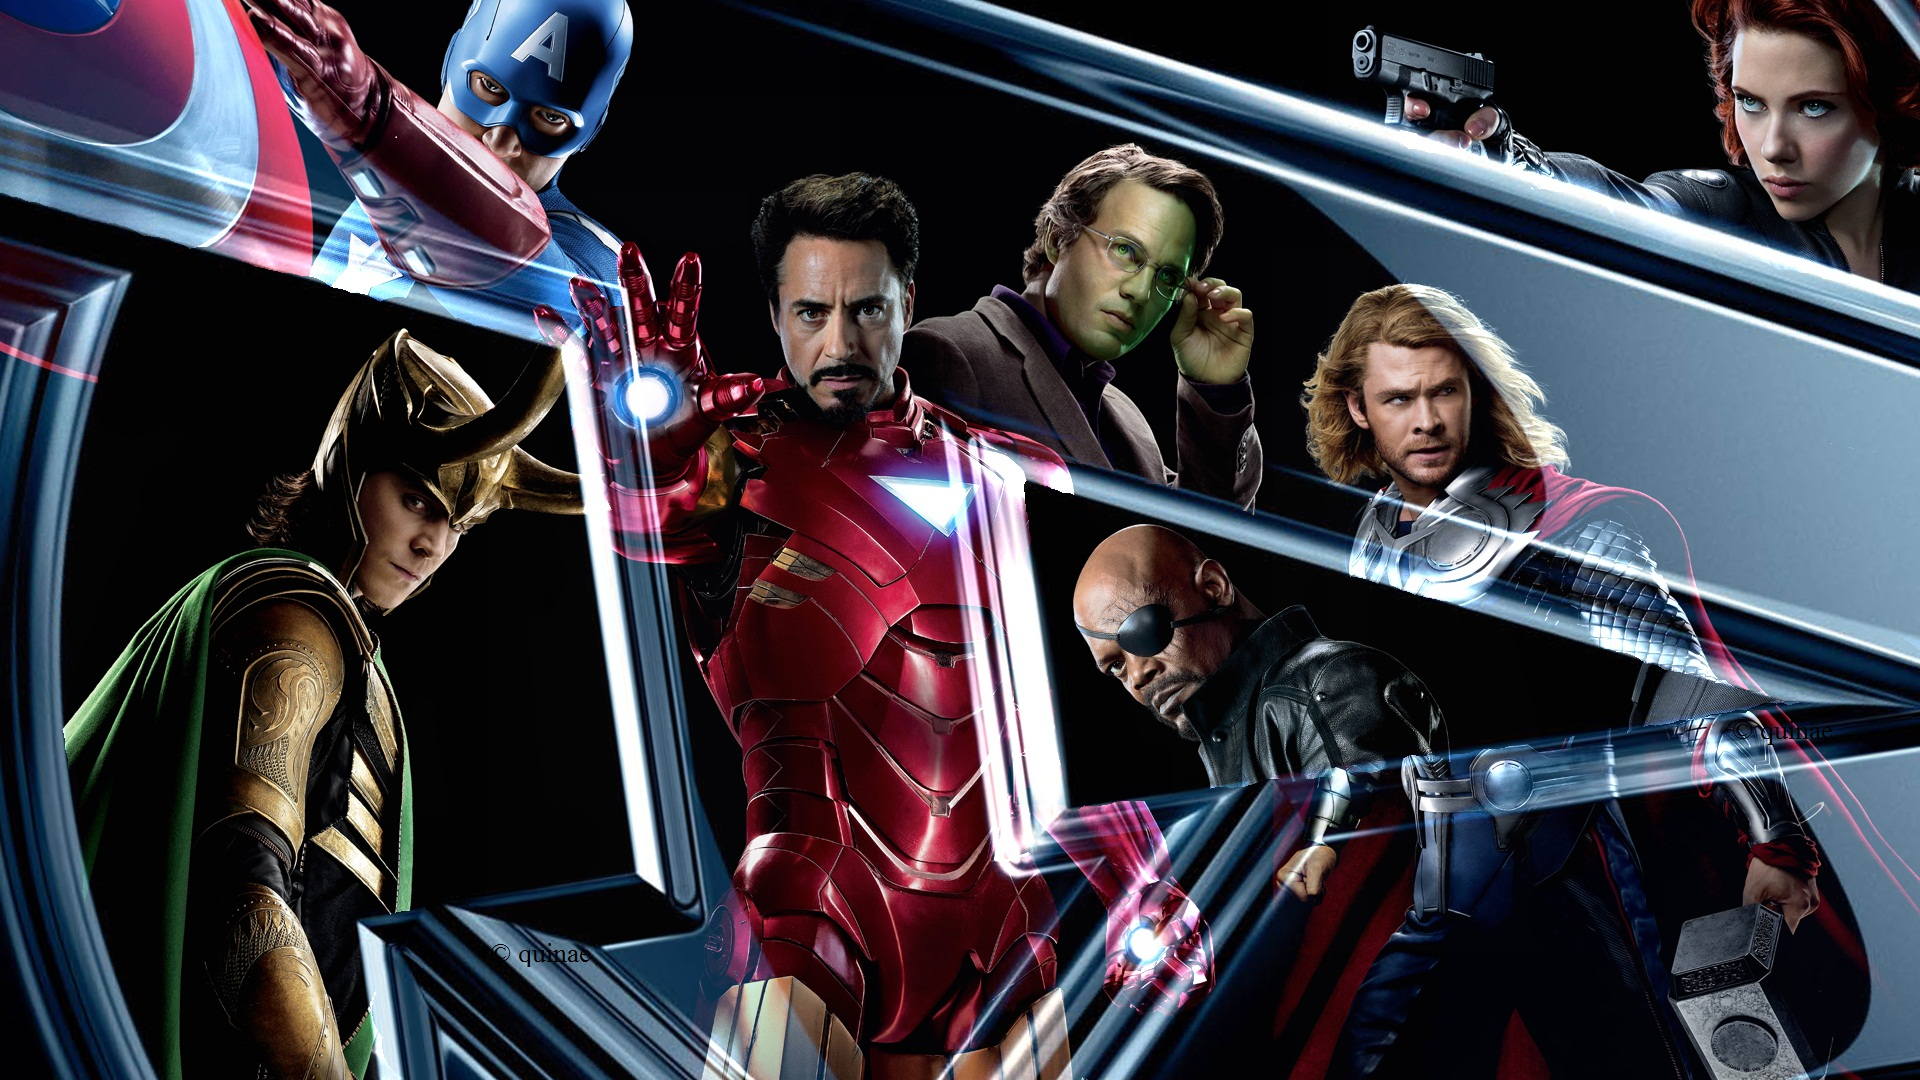 Avengers Wallpaper by Allexaire on DeviantArt